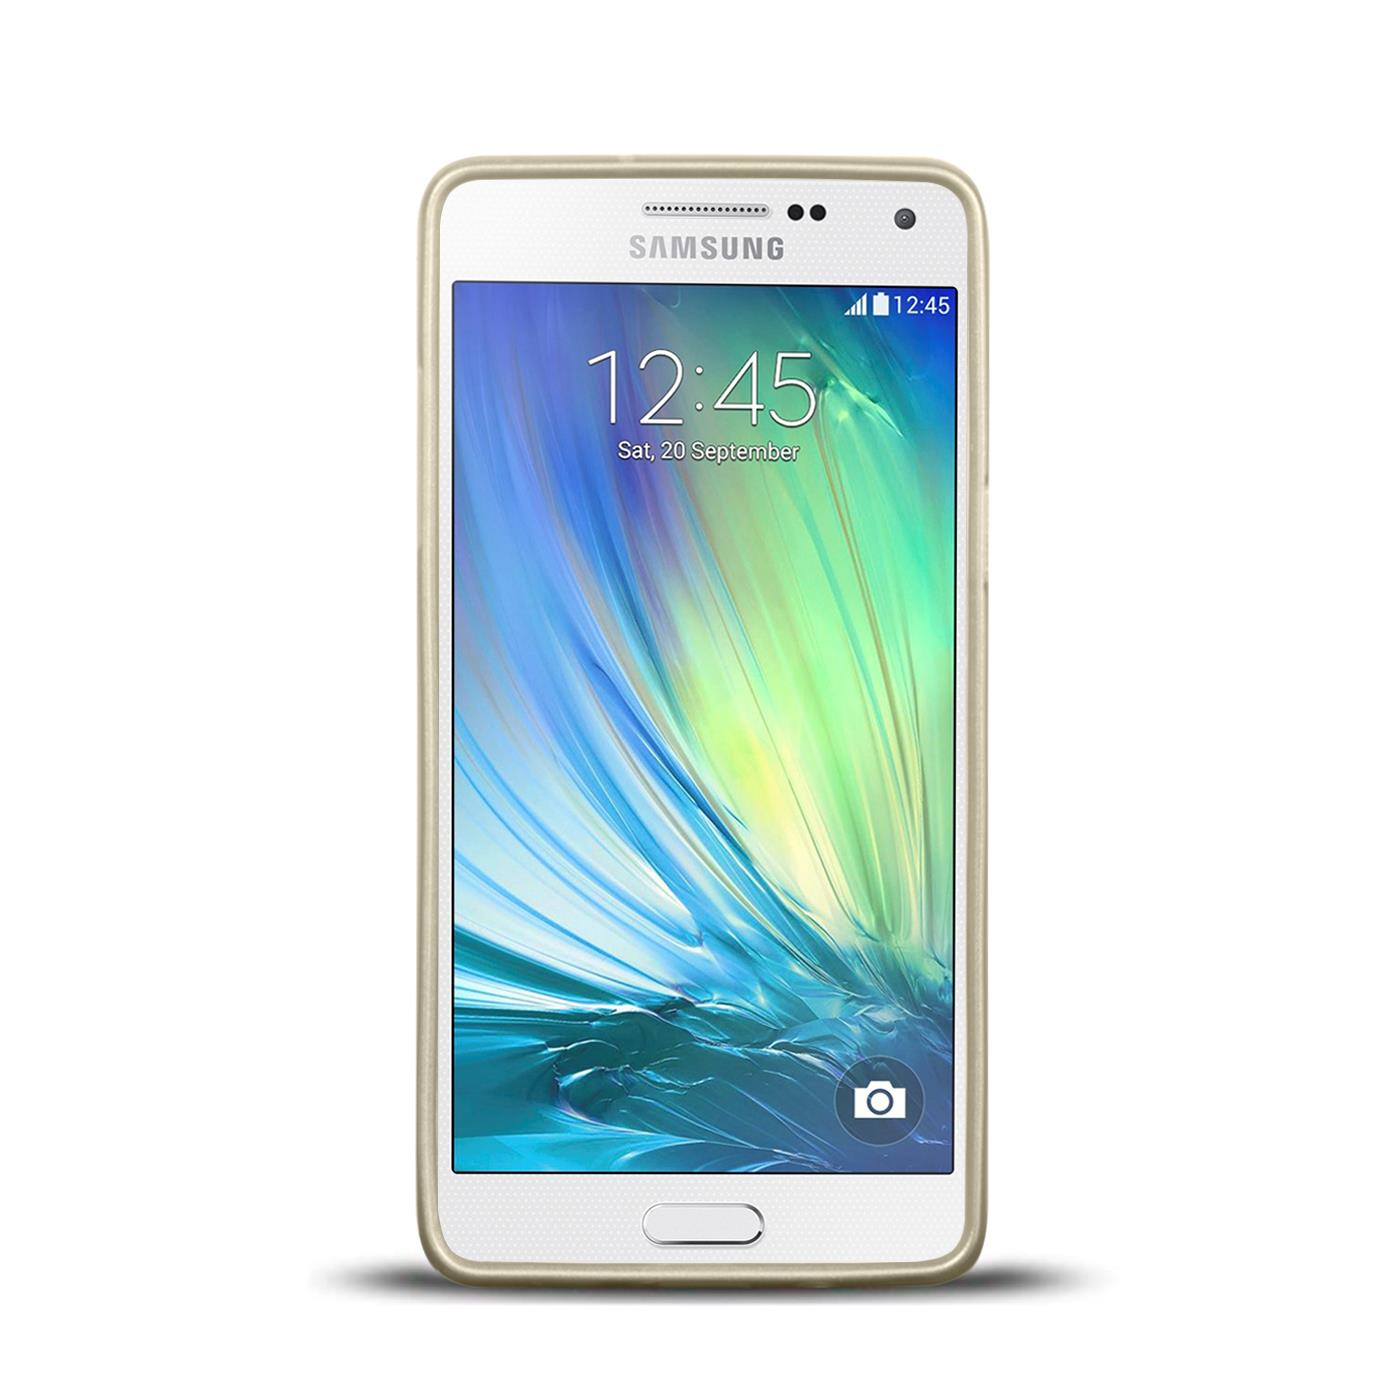 Silikon-Bumper-Case-Samsung-Galaxy-a5-2015-Ultra-Slim-Stossfeste-Rueckschale Indexbild 11